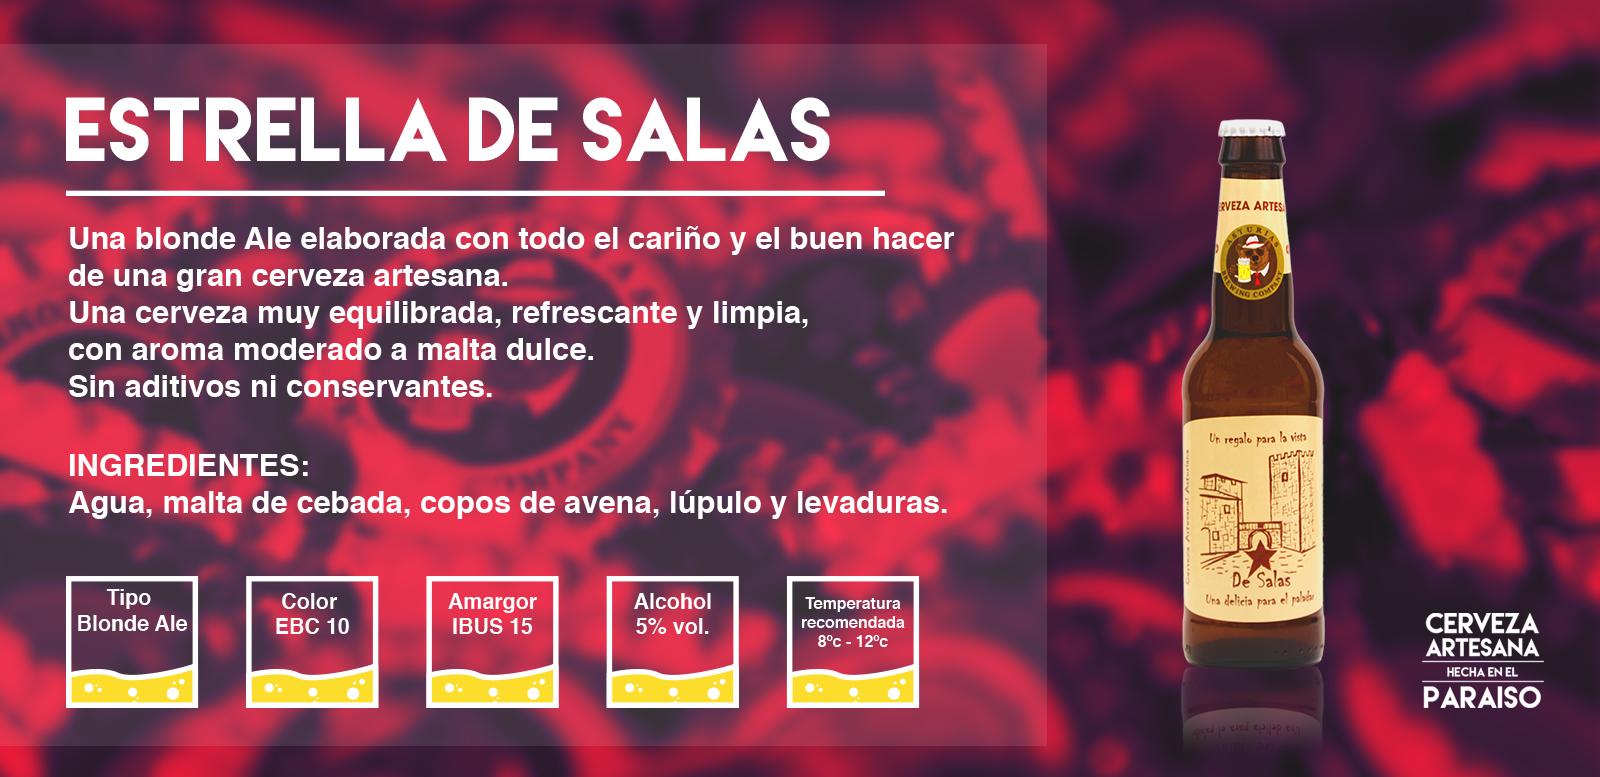 https://asturiasbrewingcompany.com/wp-content/uploads/2018/11/ficha-estrella-salas-1.jpg